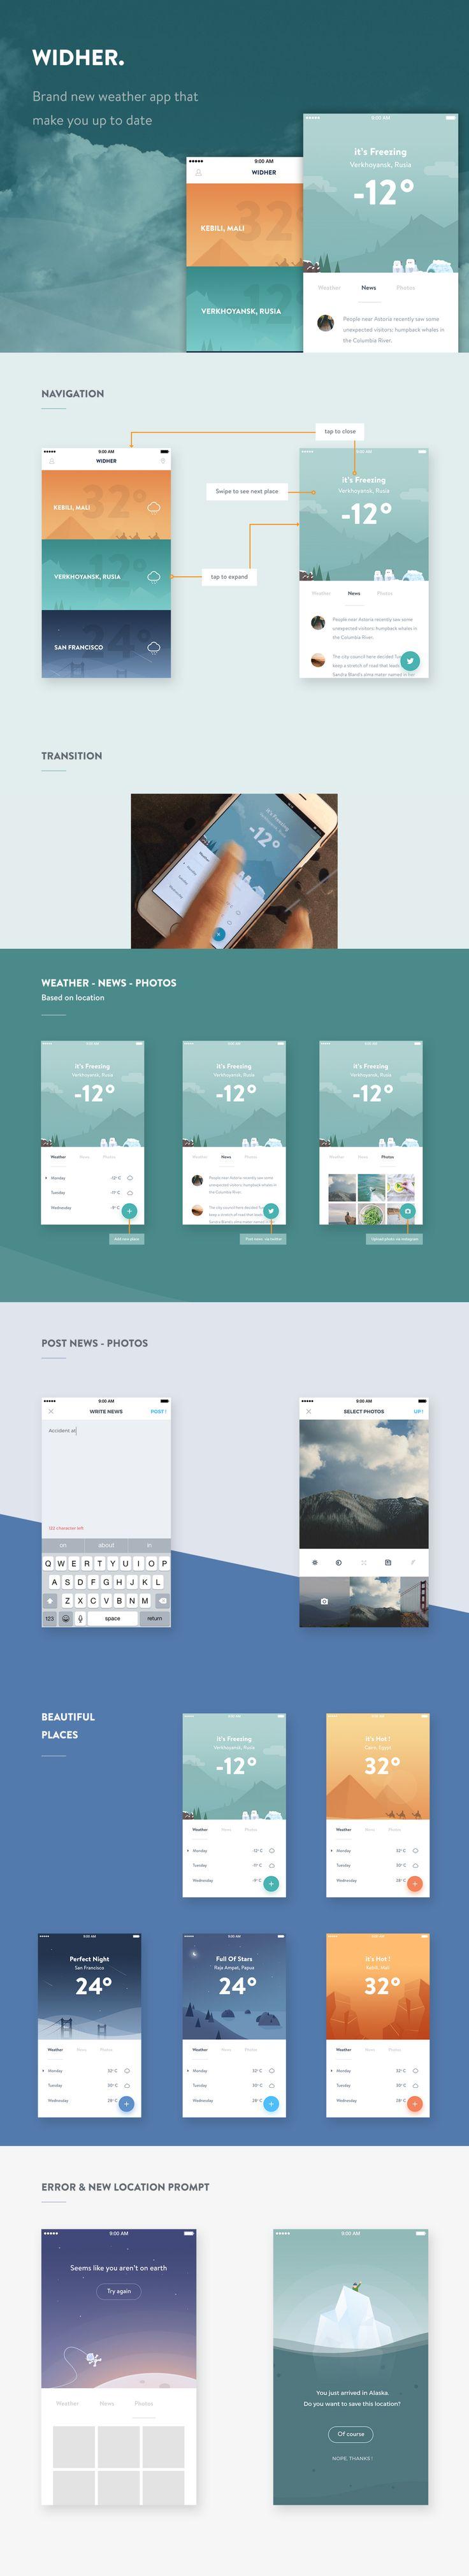 Widher - weather app concept par Ghani Pradita